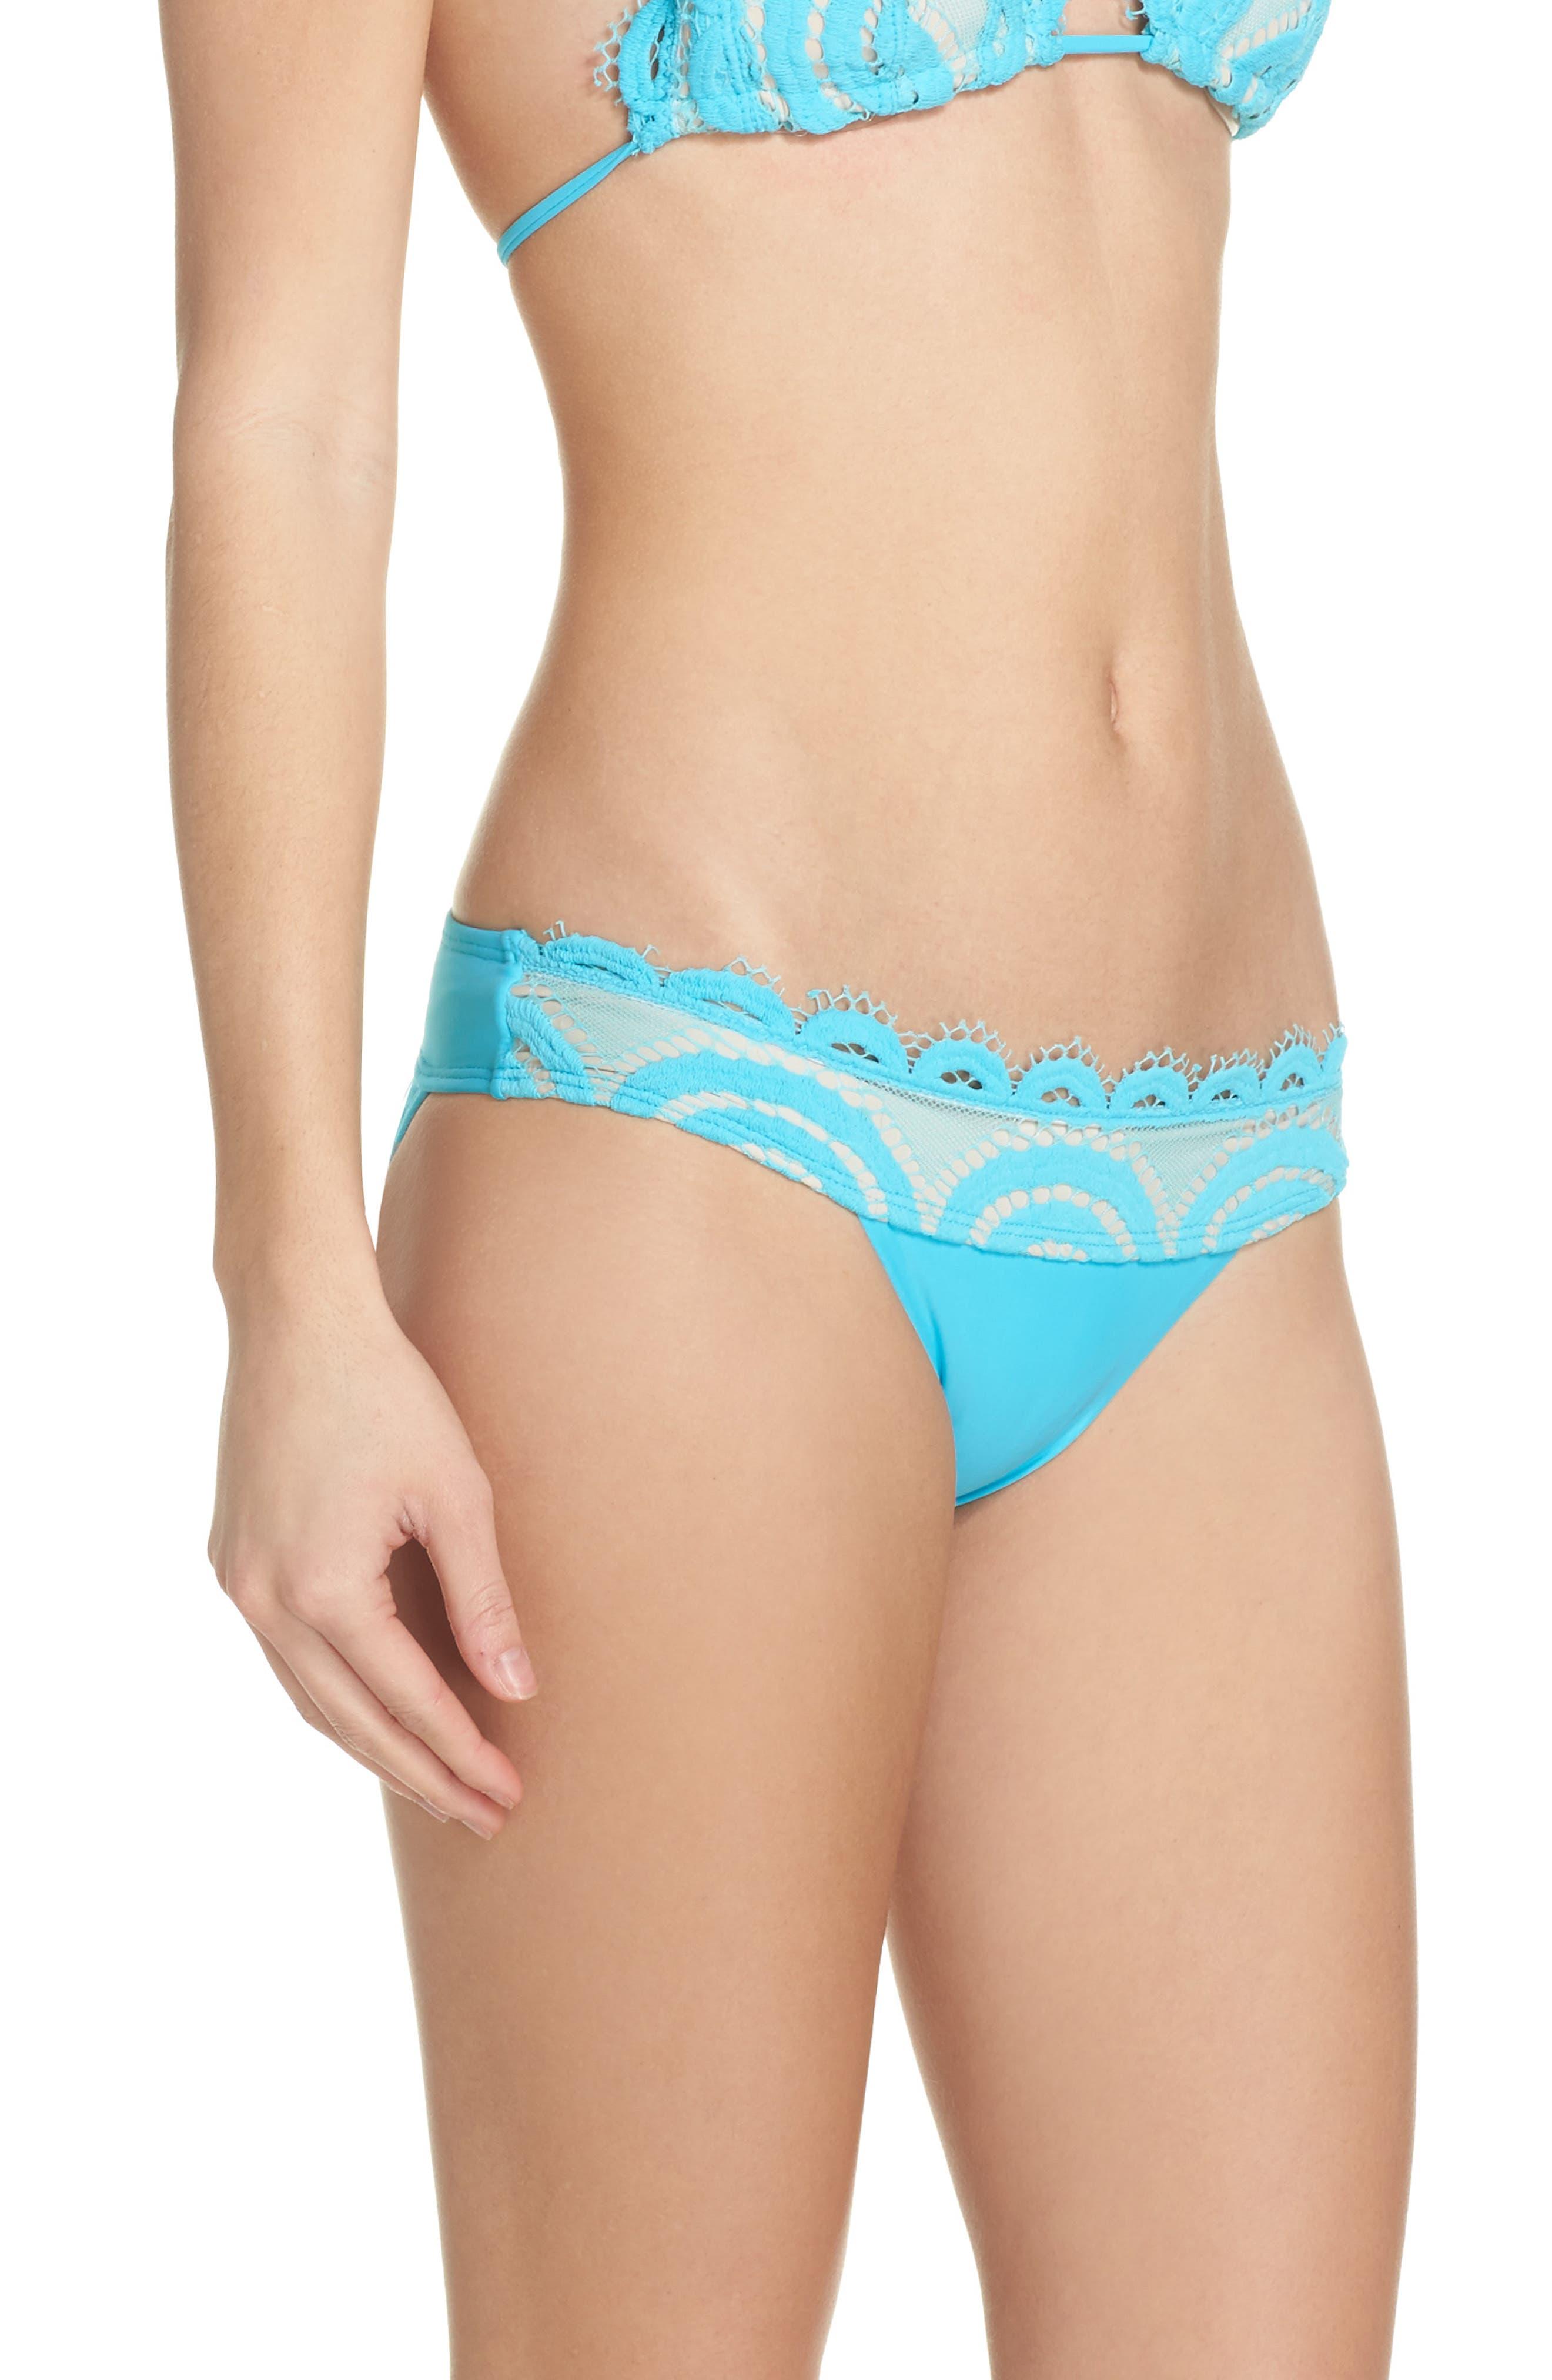 Banded Lace Bikini Bottoms,                             Alternate thumbnail 3, color,                             415